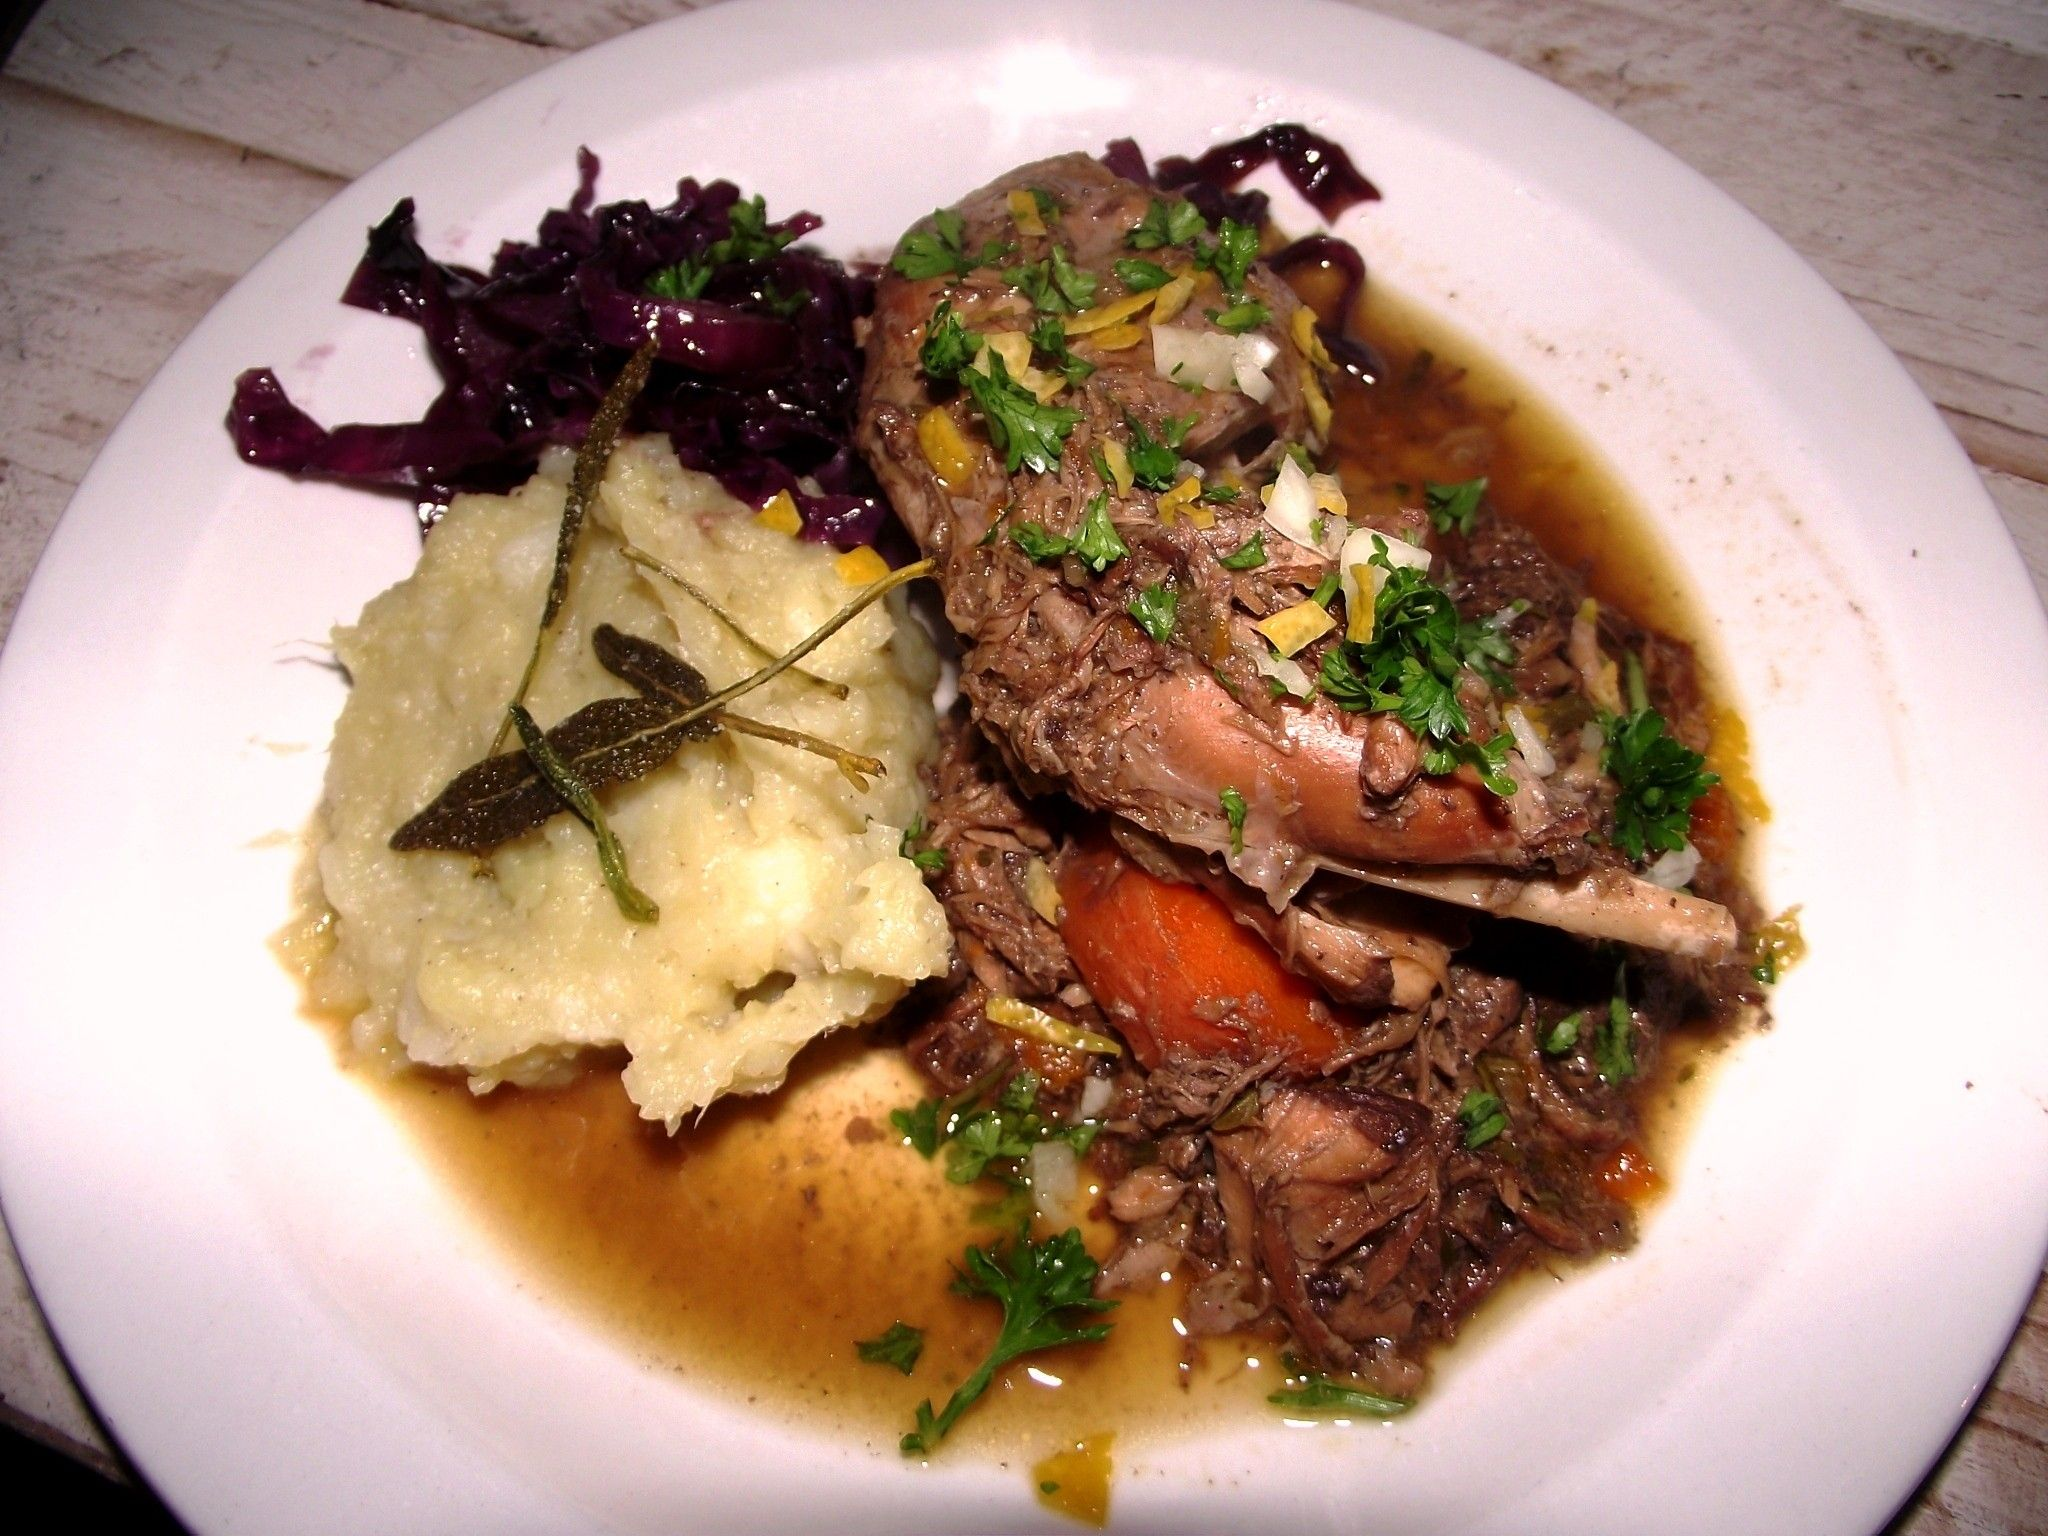 Braised Rabbit, Sweet potato, red cabbage. BLOG The